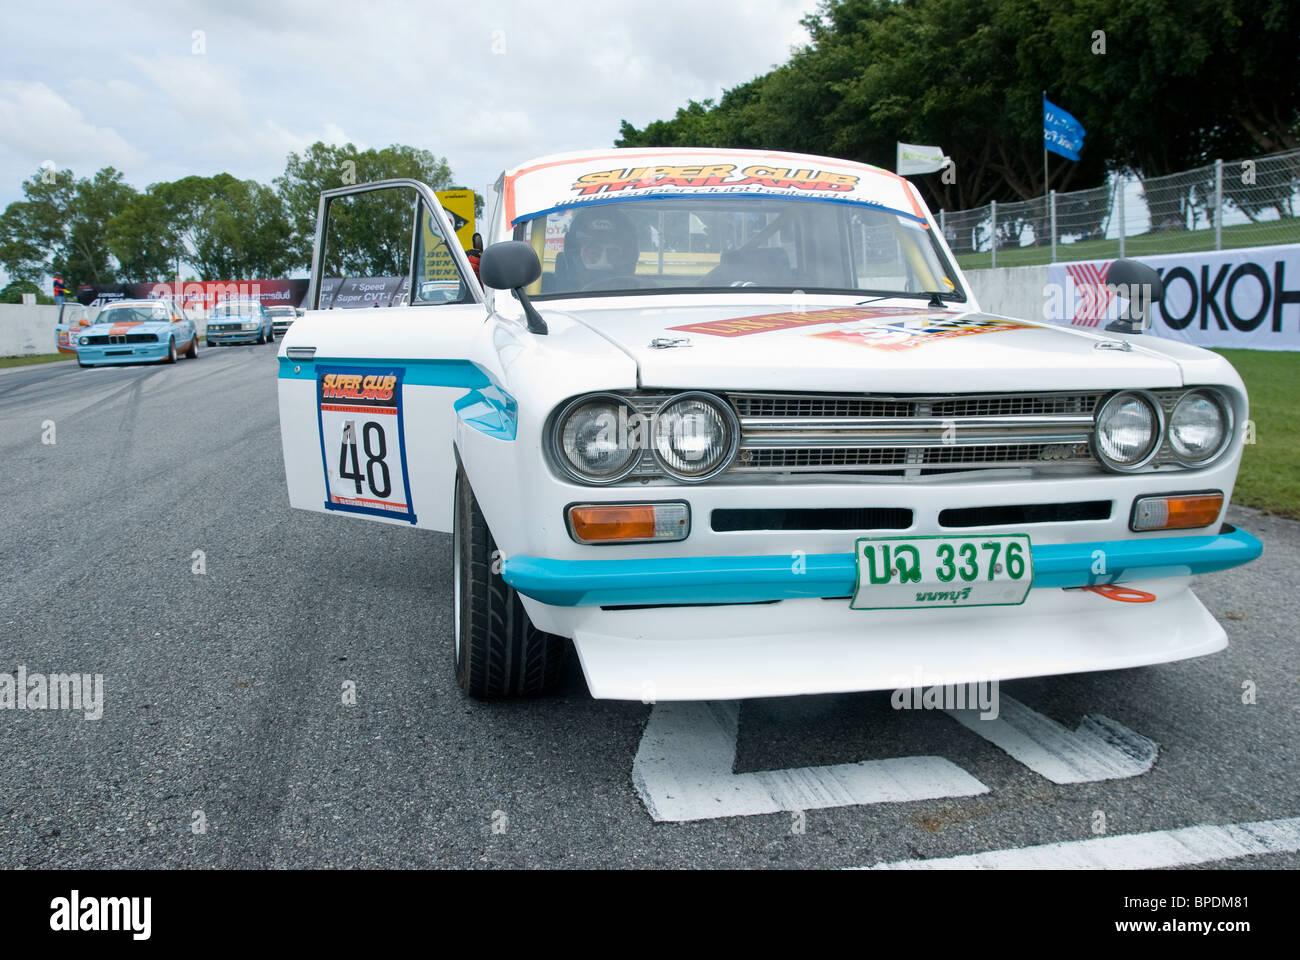 Classic Datsun Stock Photos & Classic Datsun Stock Images - Alamy